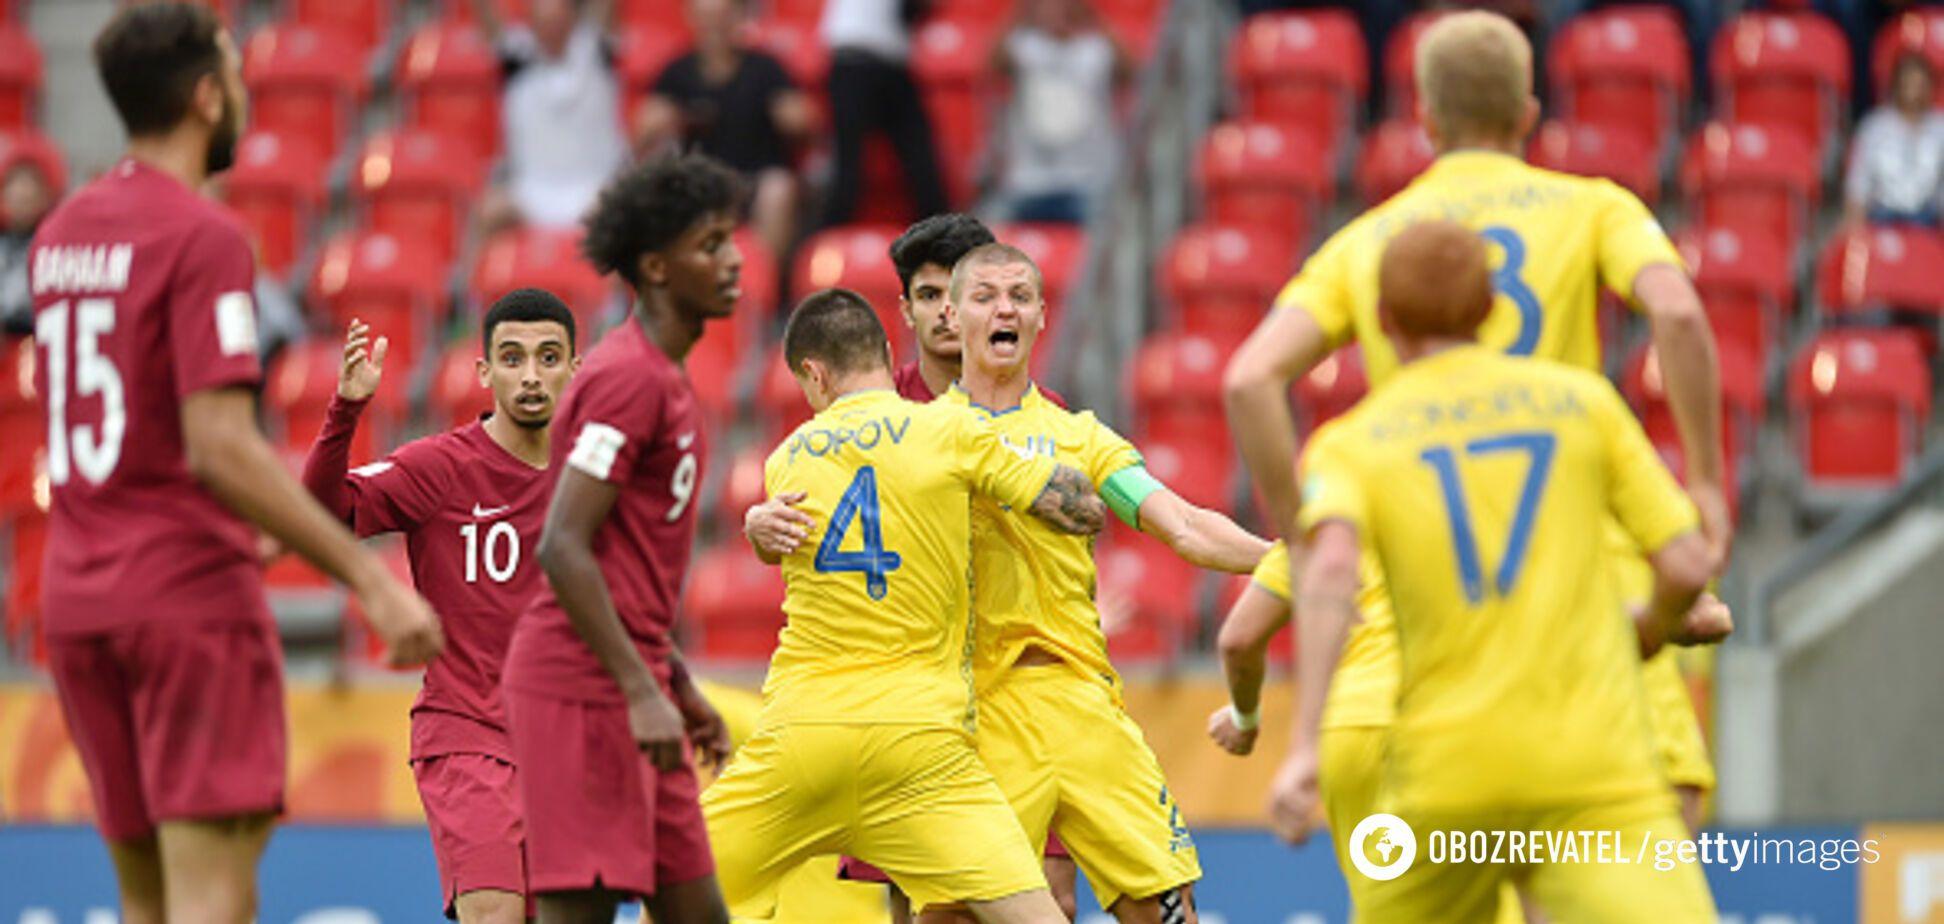 Украина досрочно вышла в плей-офф чемпионата мира по футболу U-20